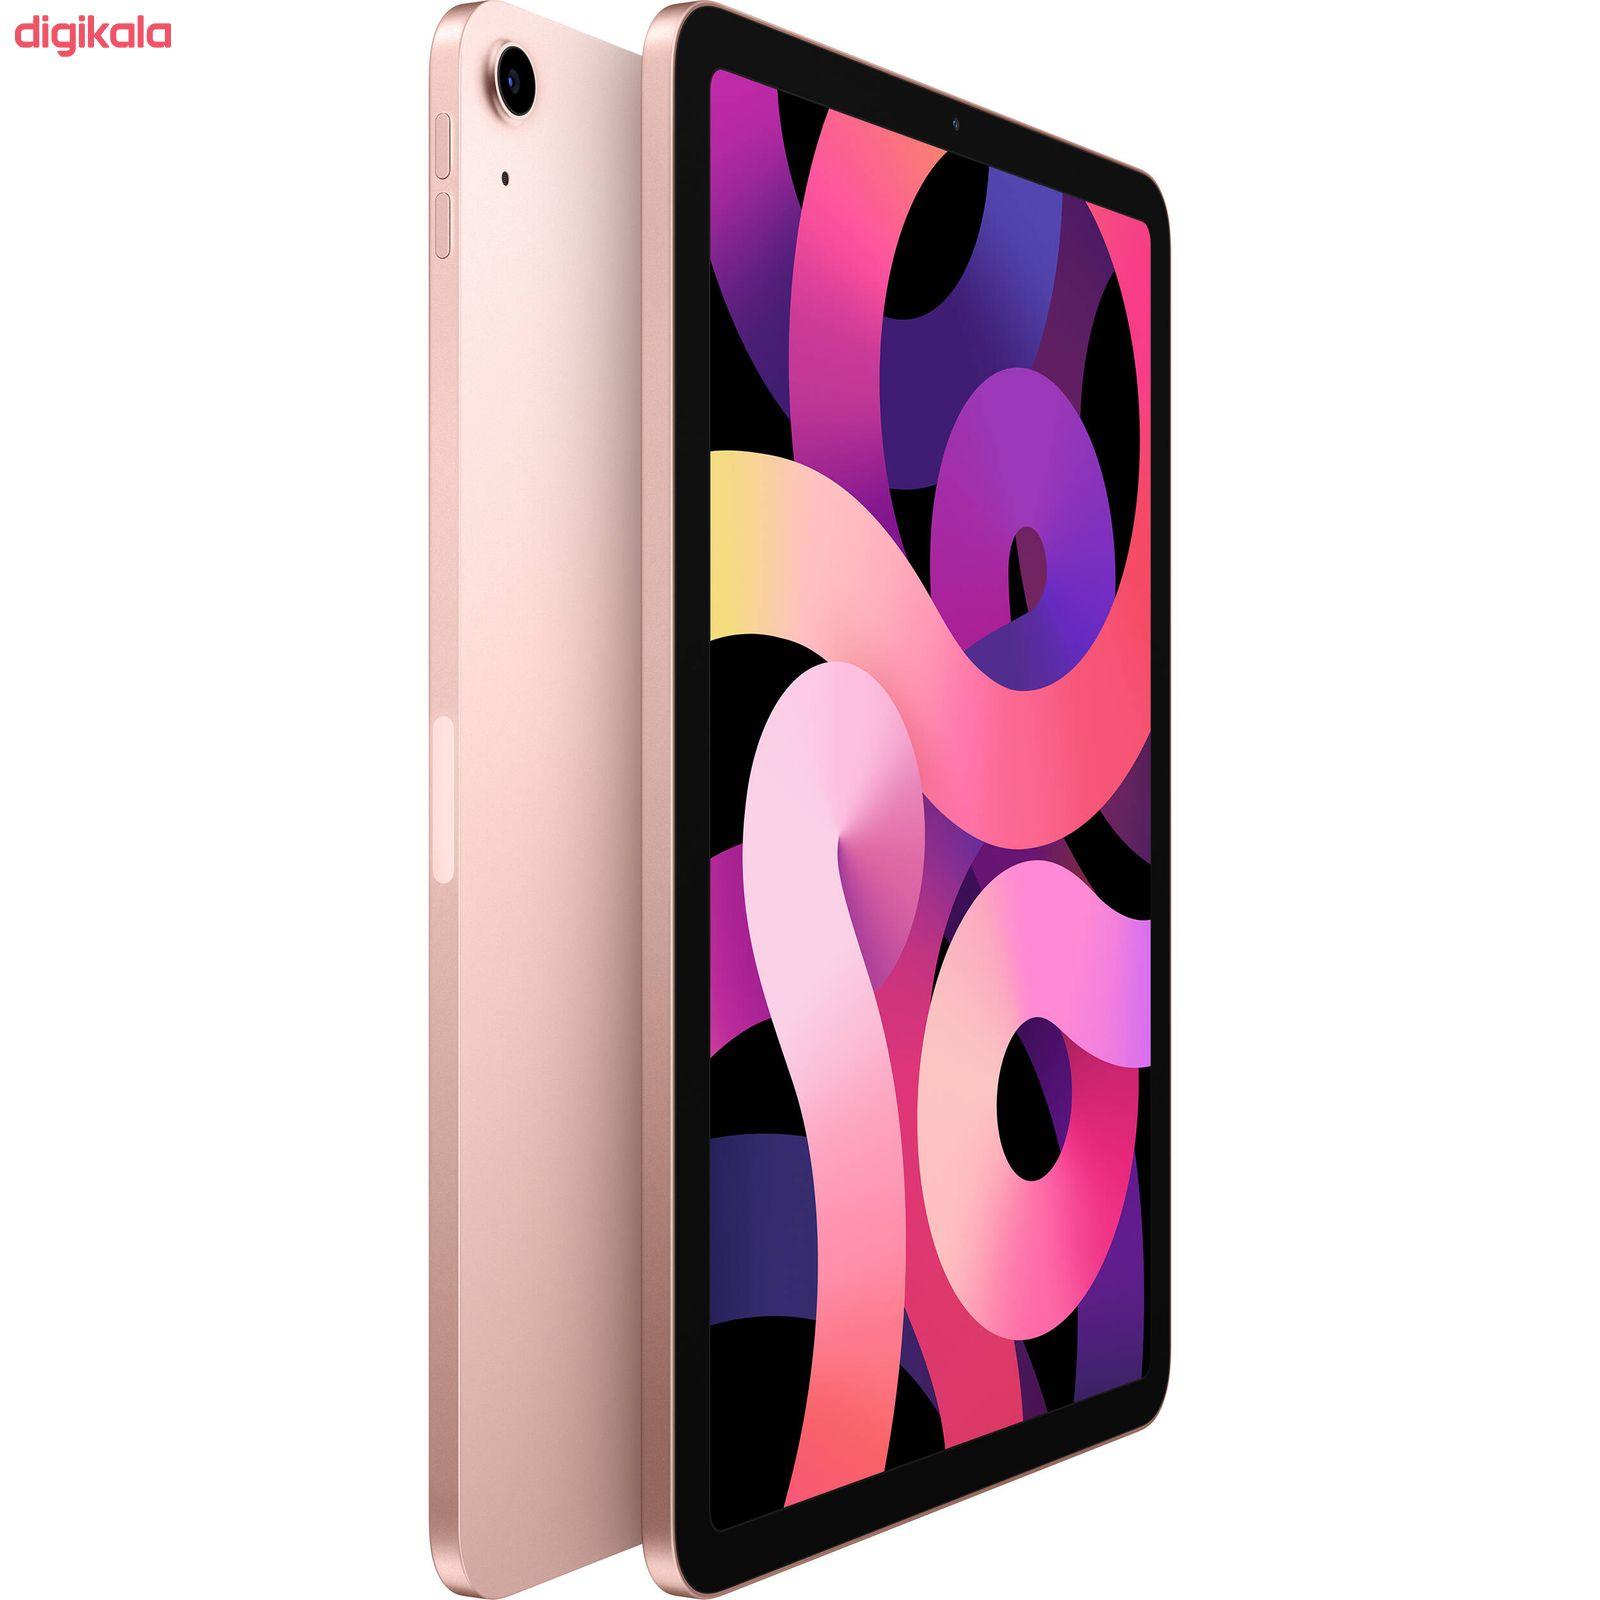 تبلت اپل مدل iPad Air 10.9 inch 2020 WiFi ظرفیت 64 گیگابایت  main 1 11